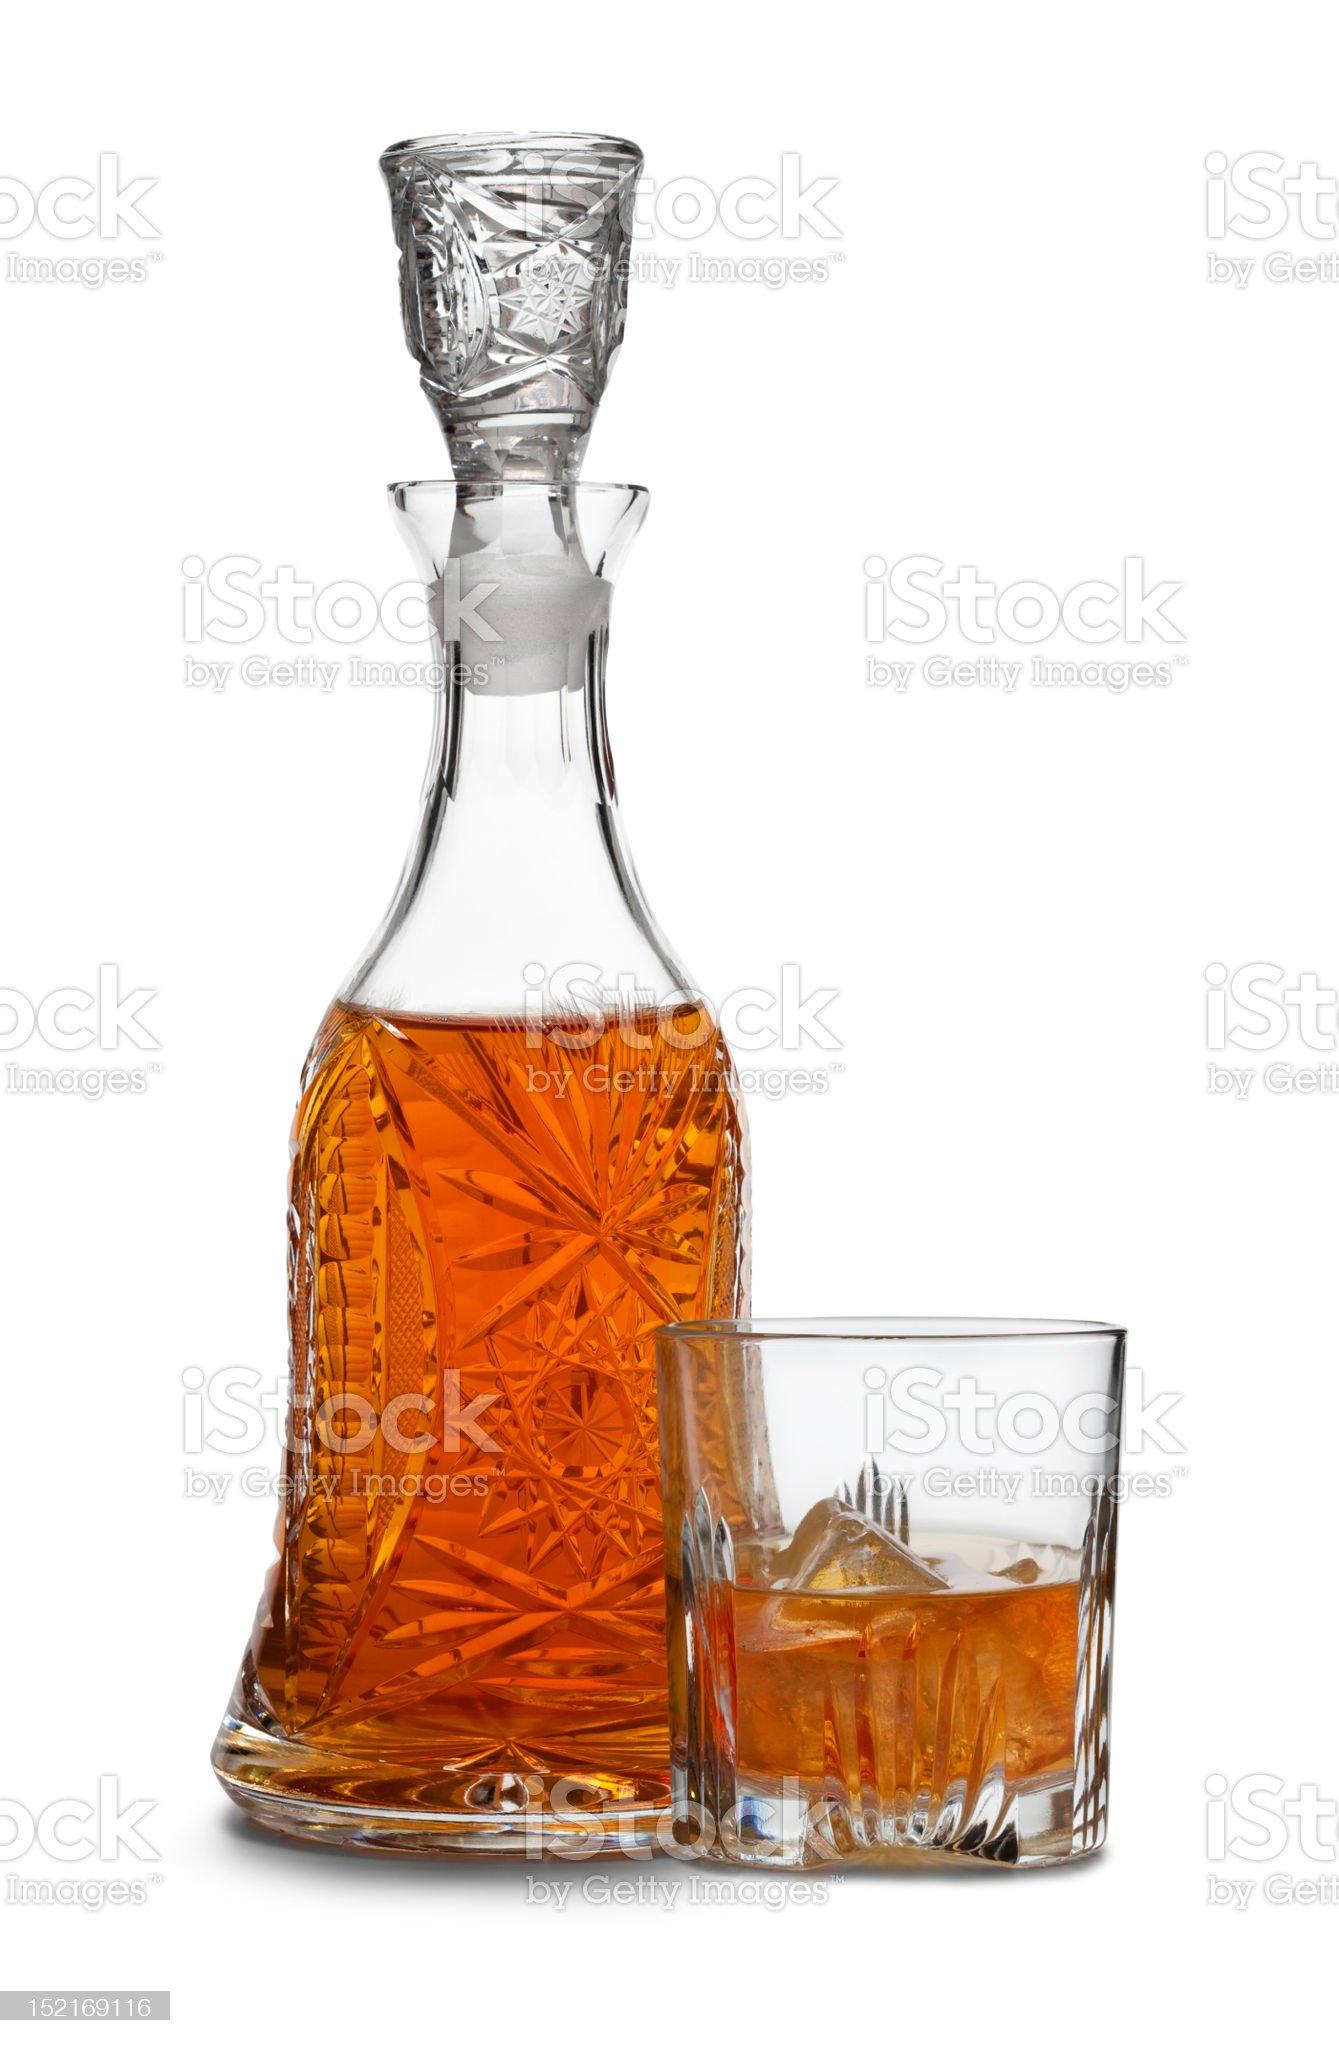 Whiskey decanter royalty-free stock photo